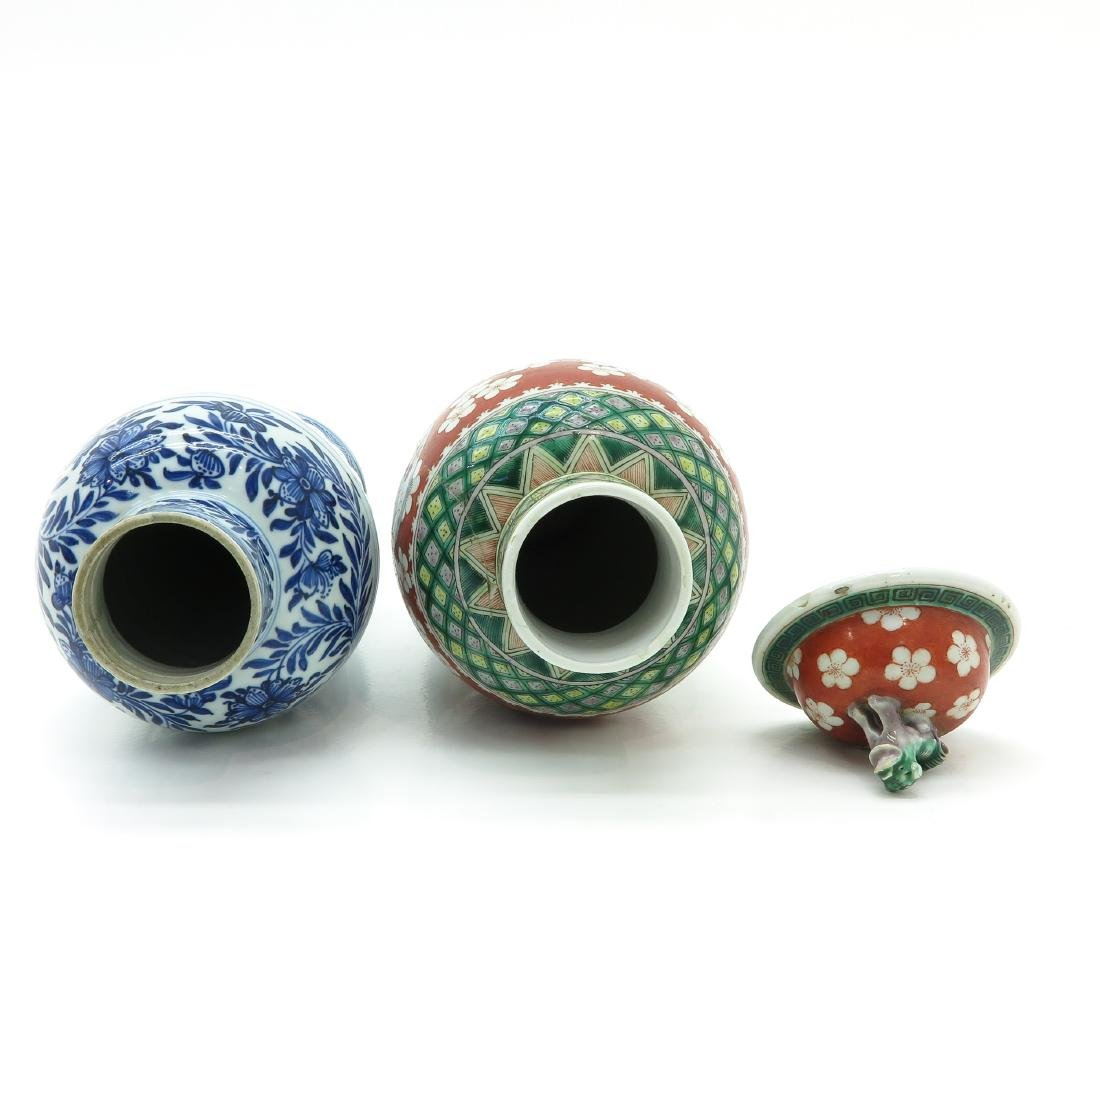 Lot of 2 Vases - 5